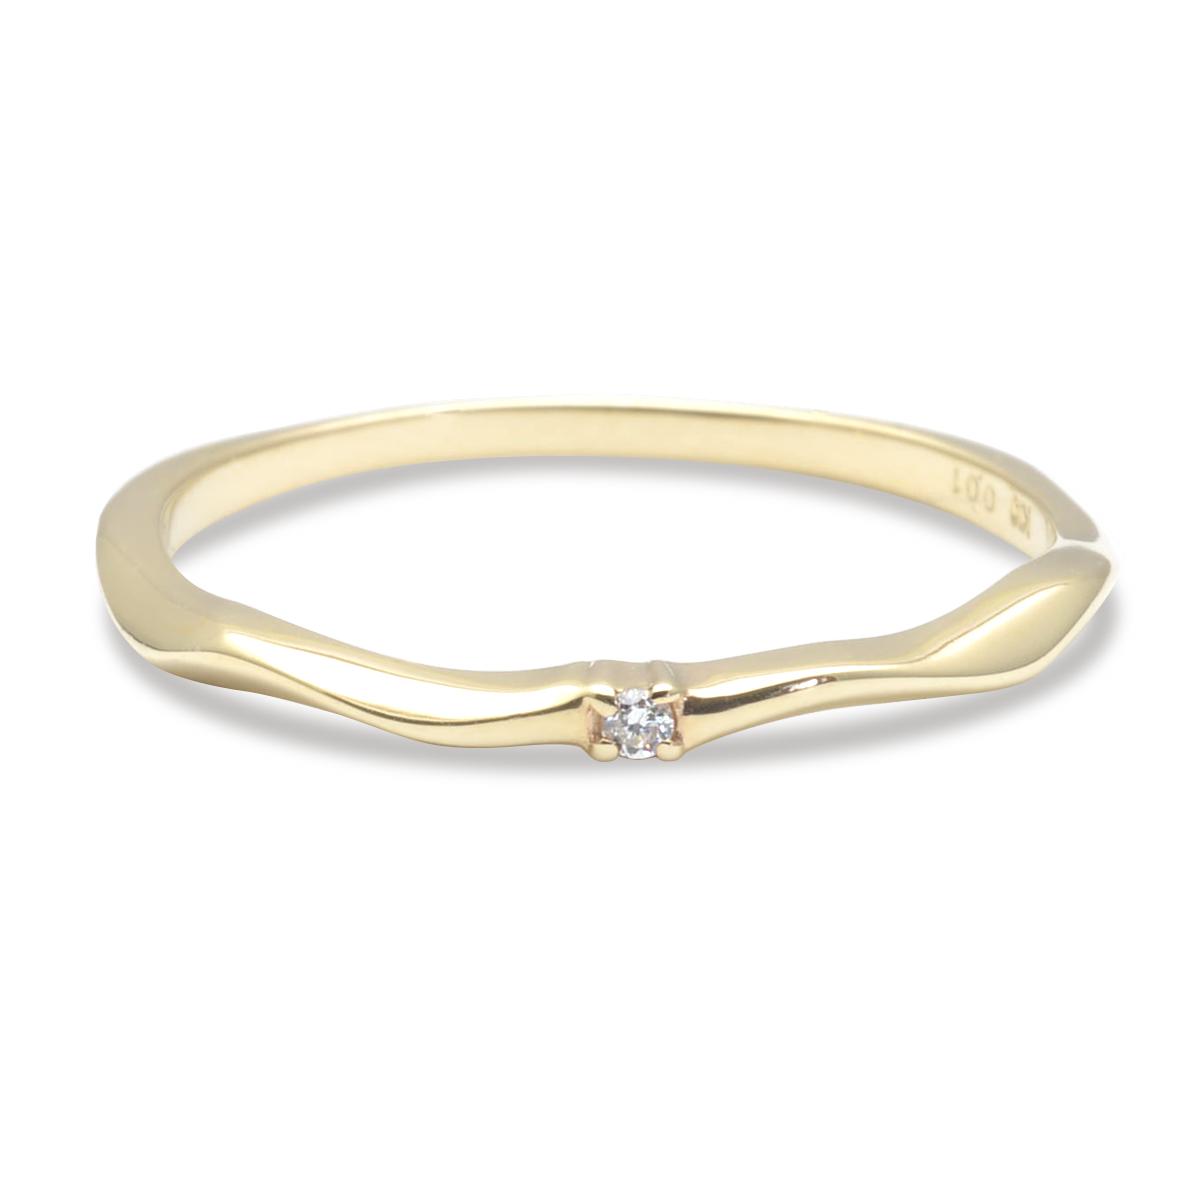 K18 ゴールド リング 指輪 ダイヤモンド ウェイビーゴールドリング (RERALUy) 華奢 新作/rri1677k18